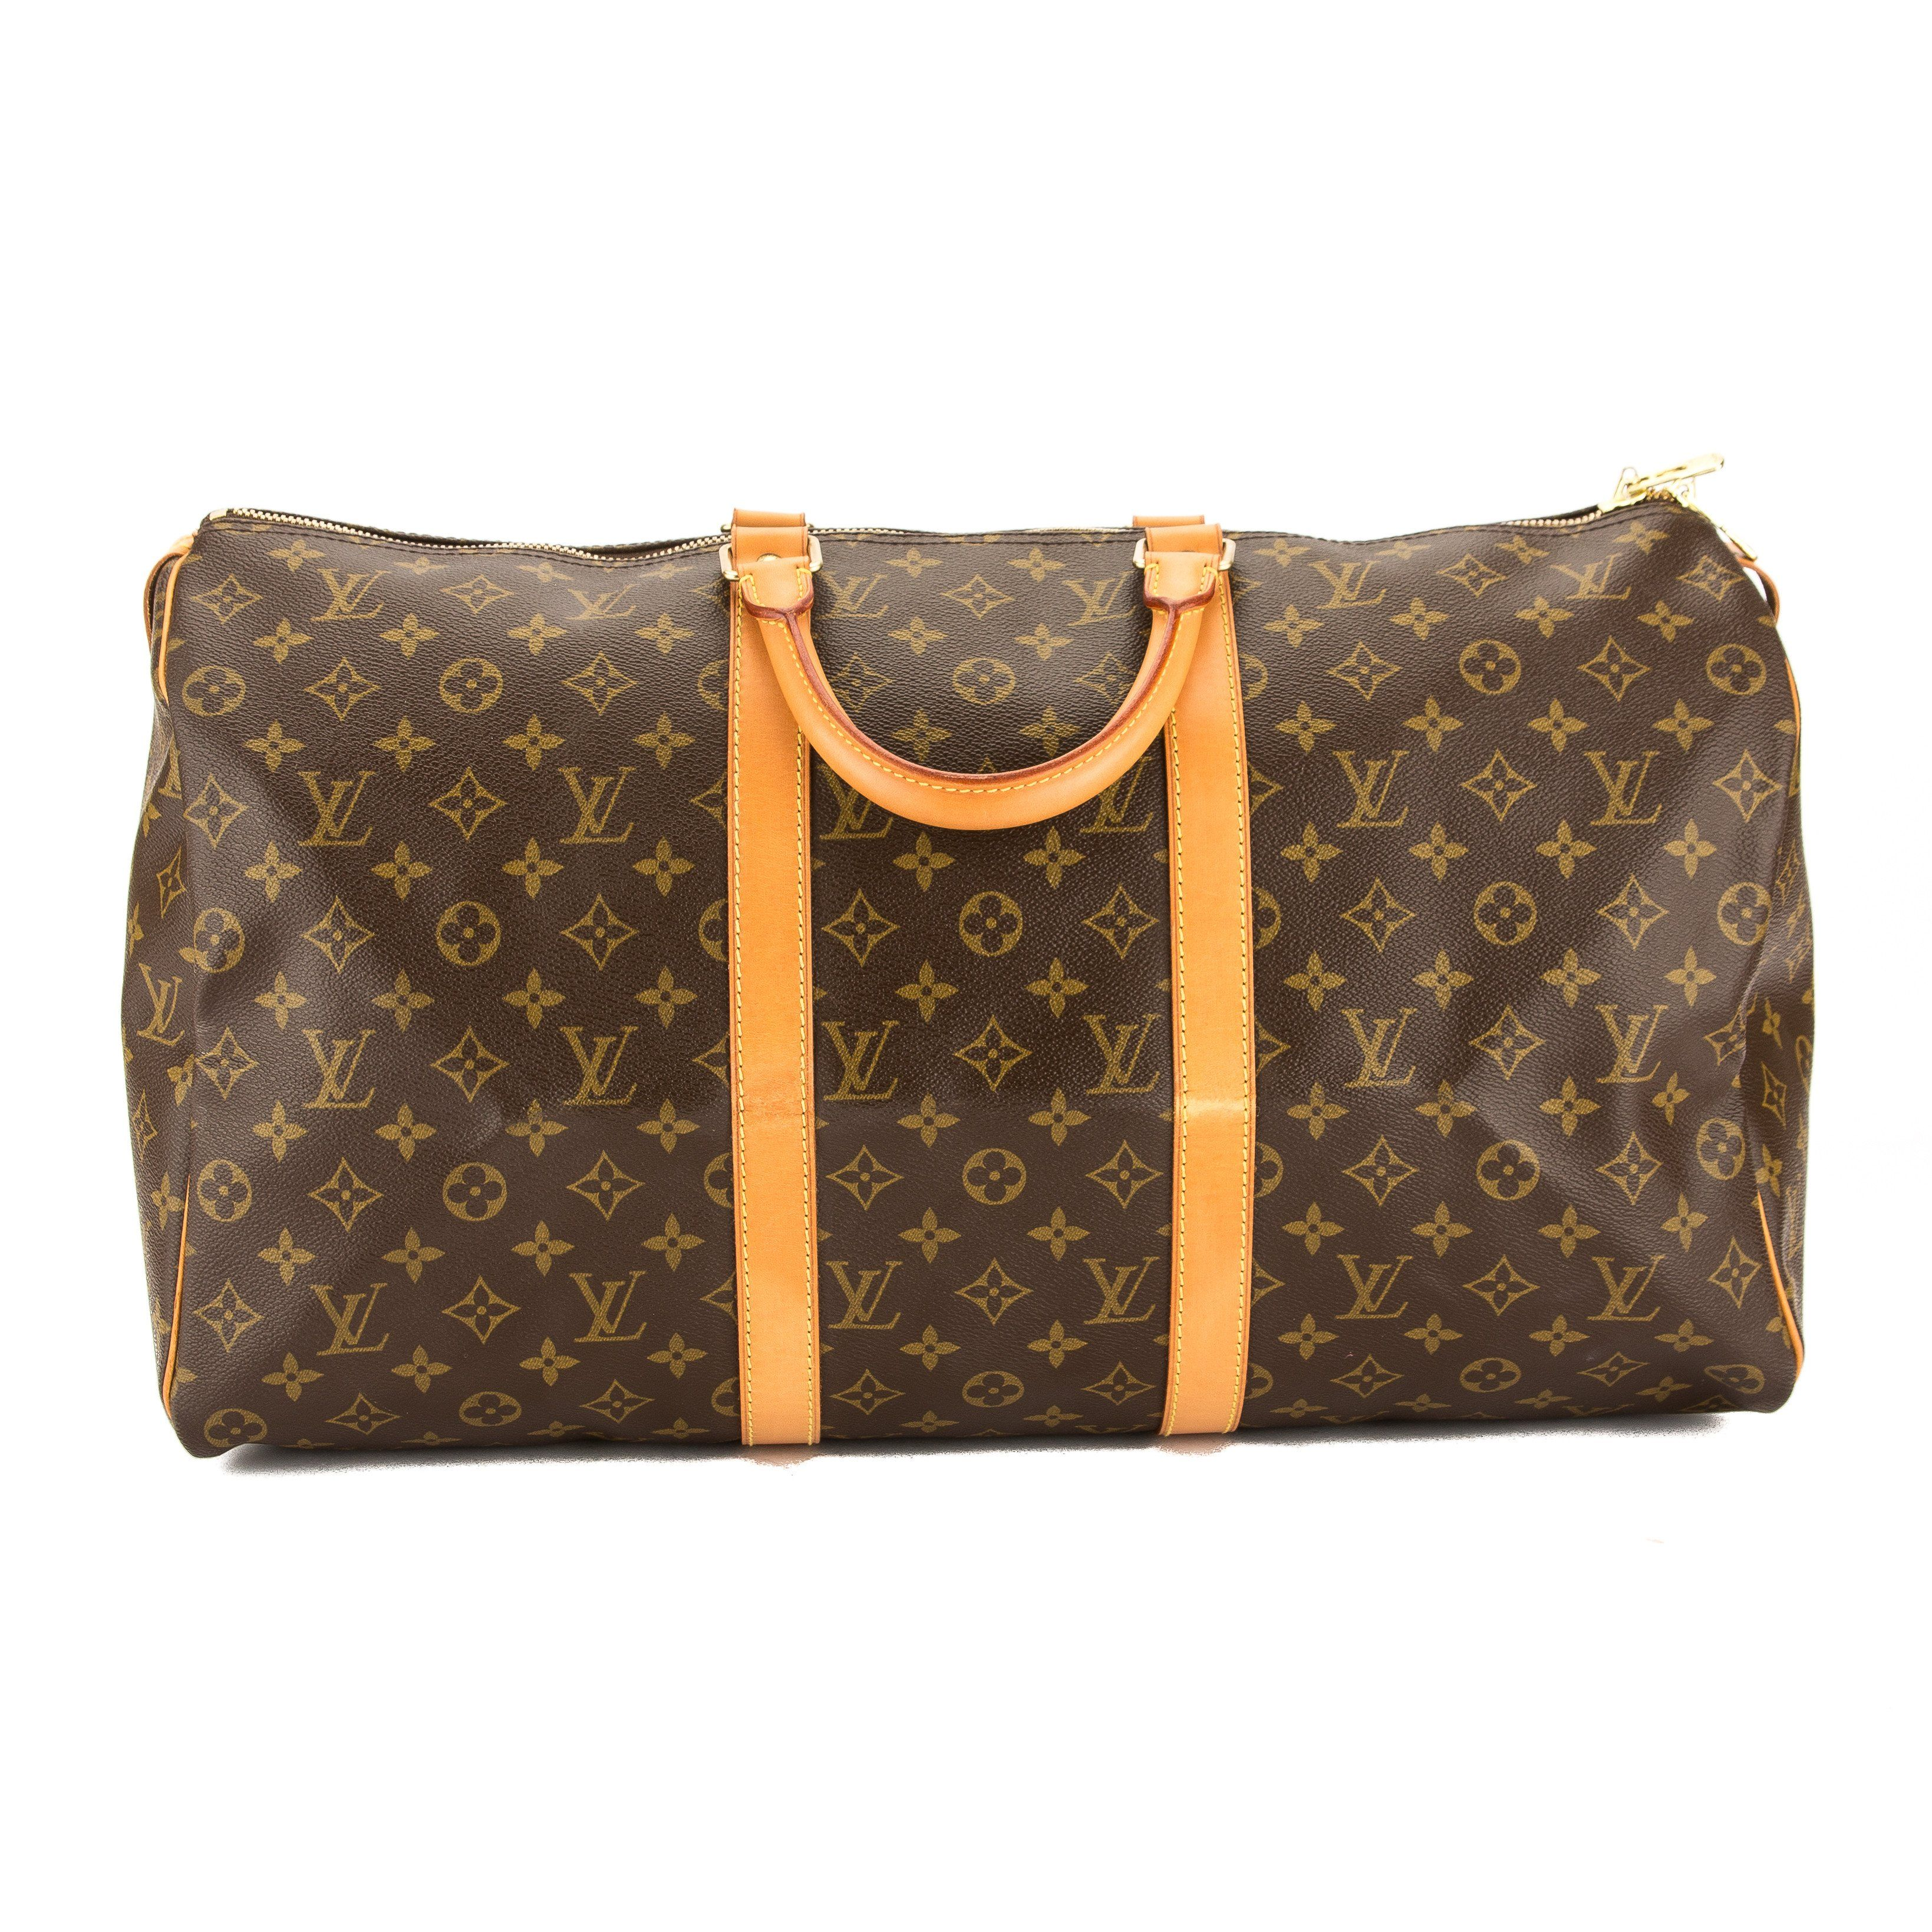 Louis Vuitton Monogram Canvas Keepall 50 Bag 3597007 Louis